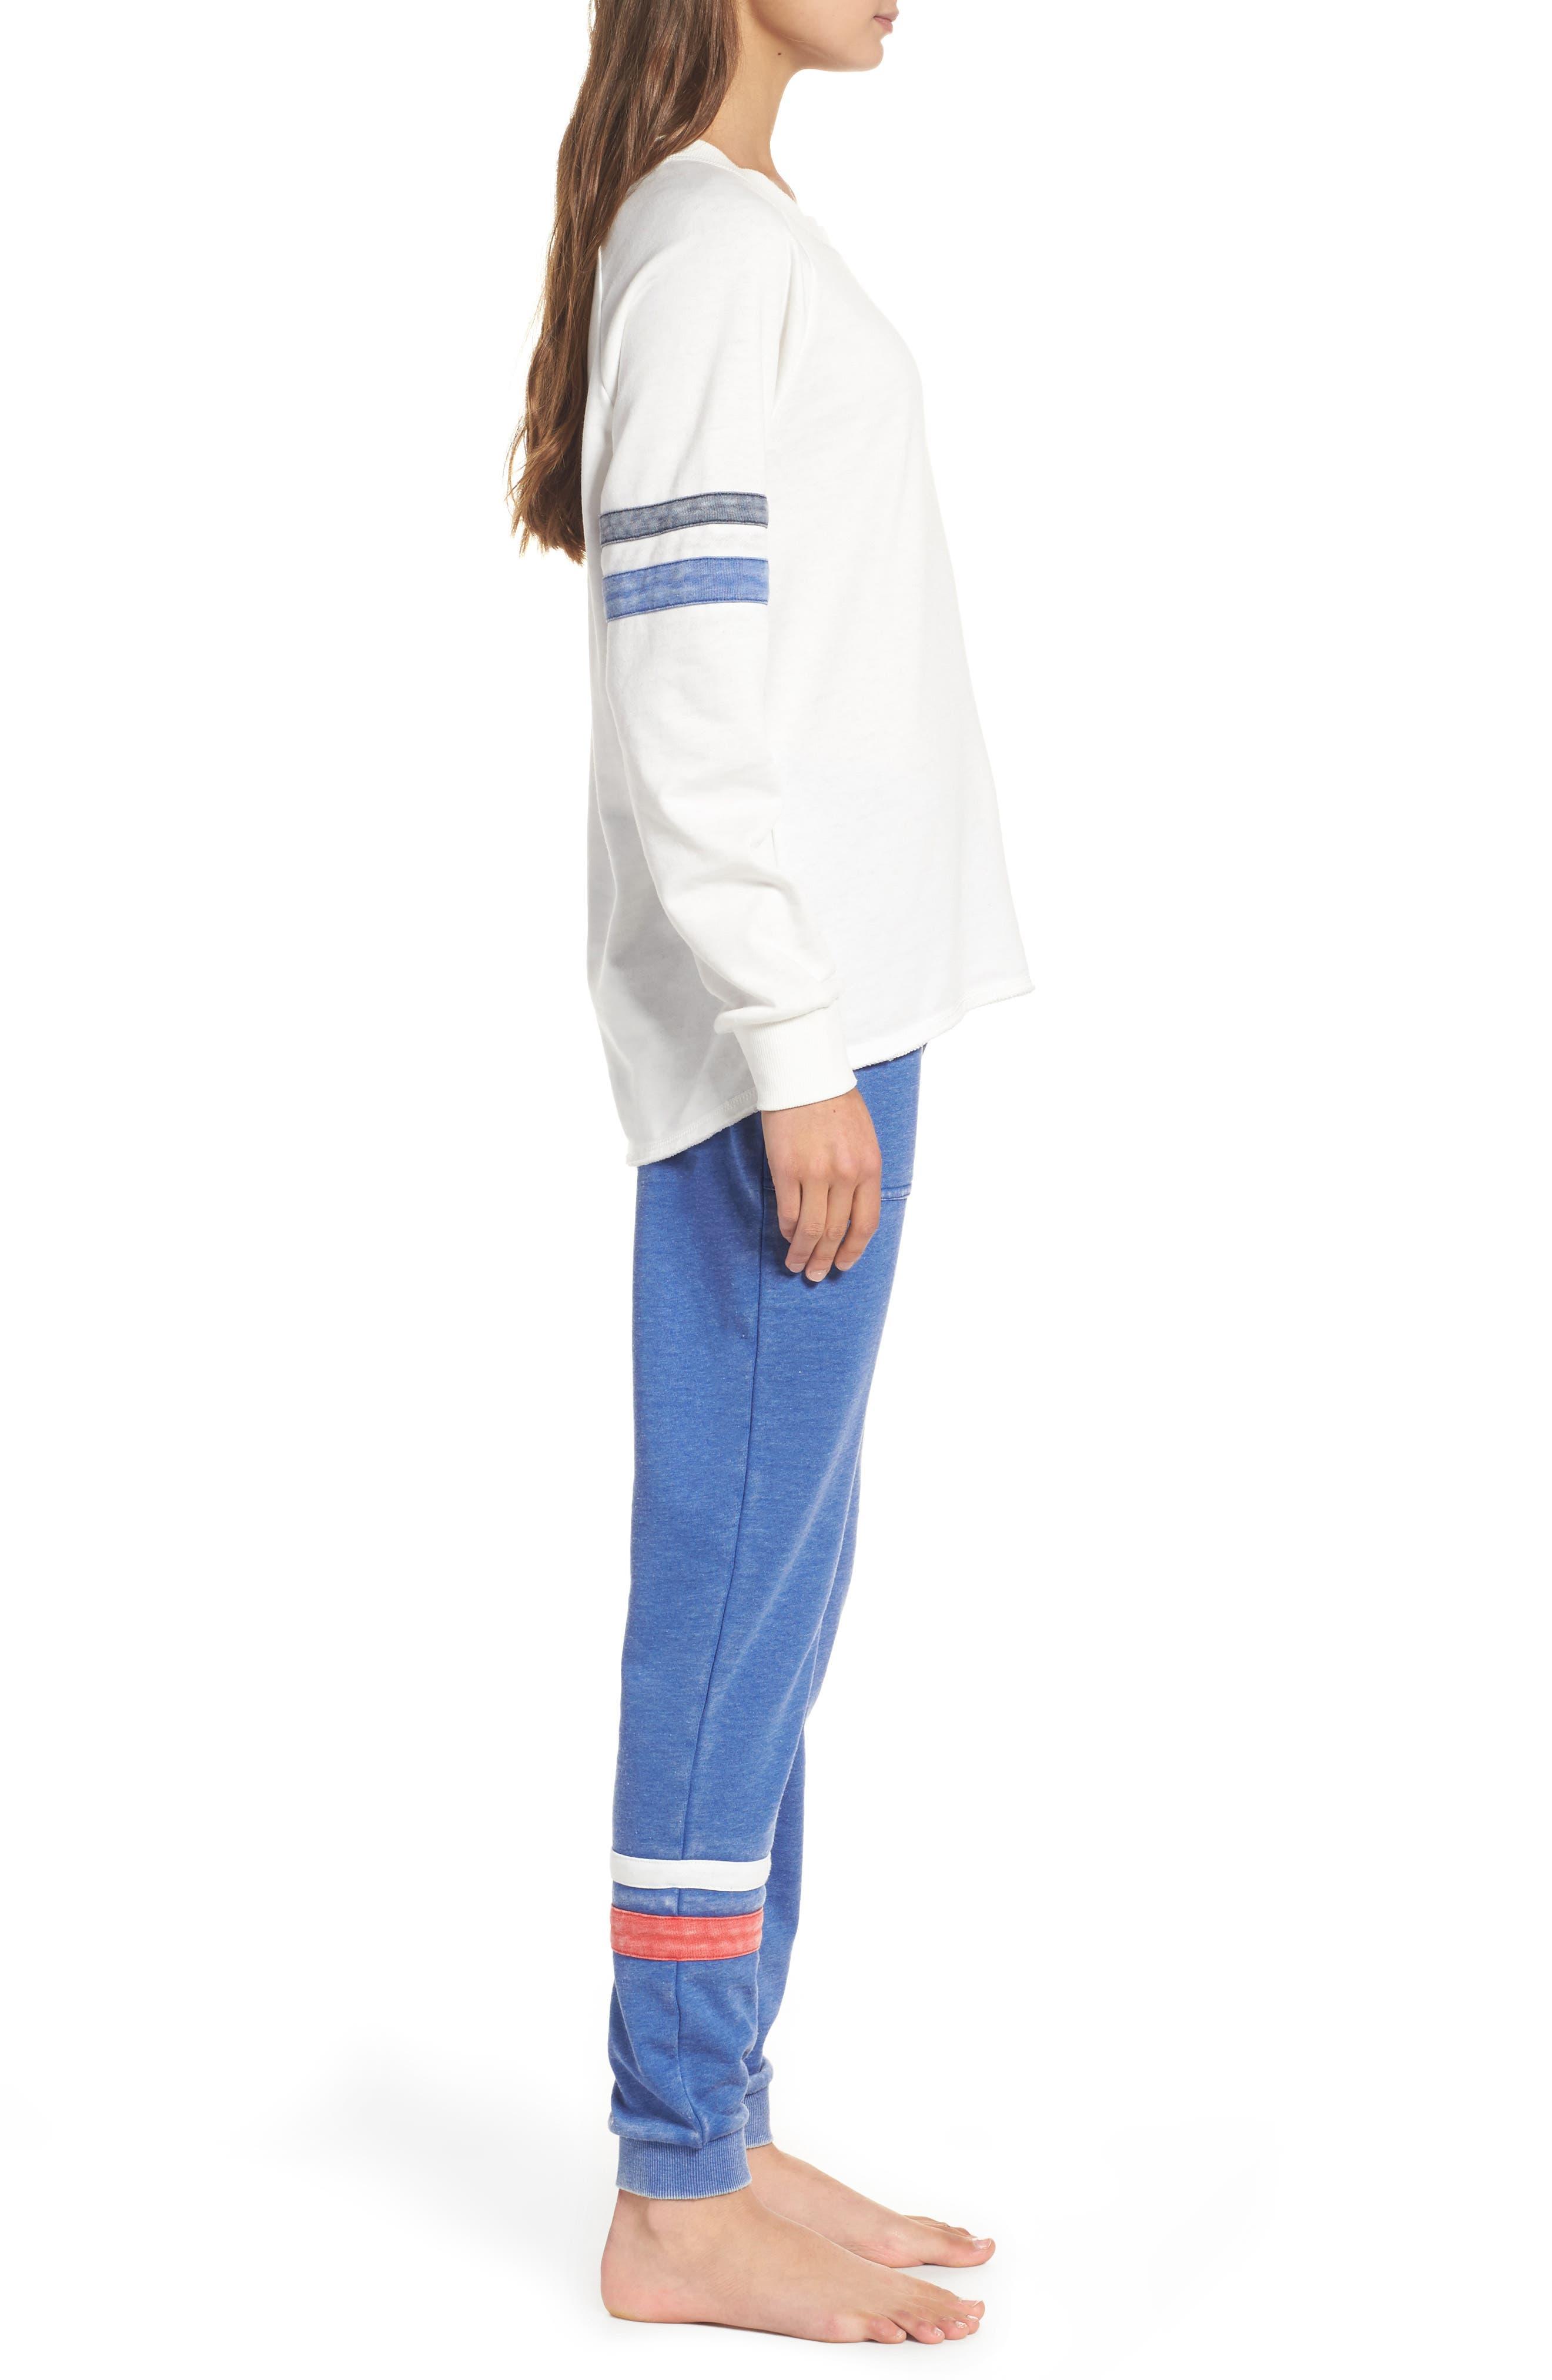 Lazy Day Sweatshirt,                             Alternate thumbnail 3, color,                             Ivory/ Dark Navy/ Pacific Blue